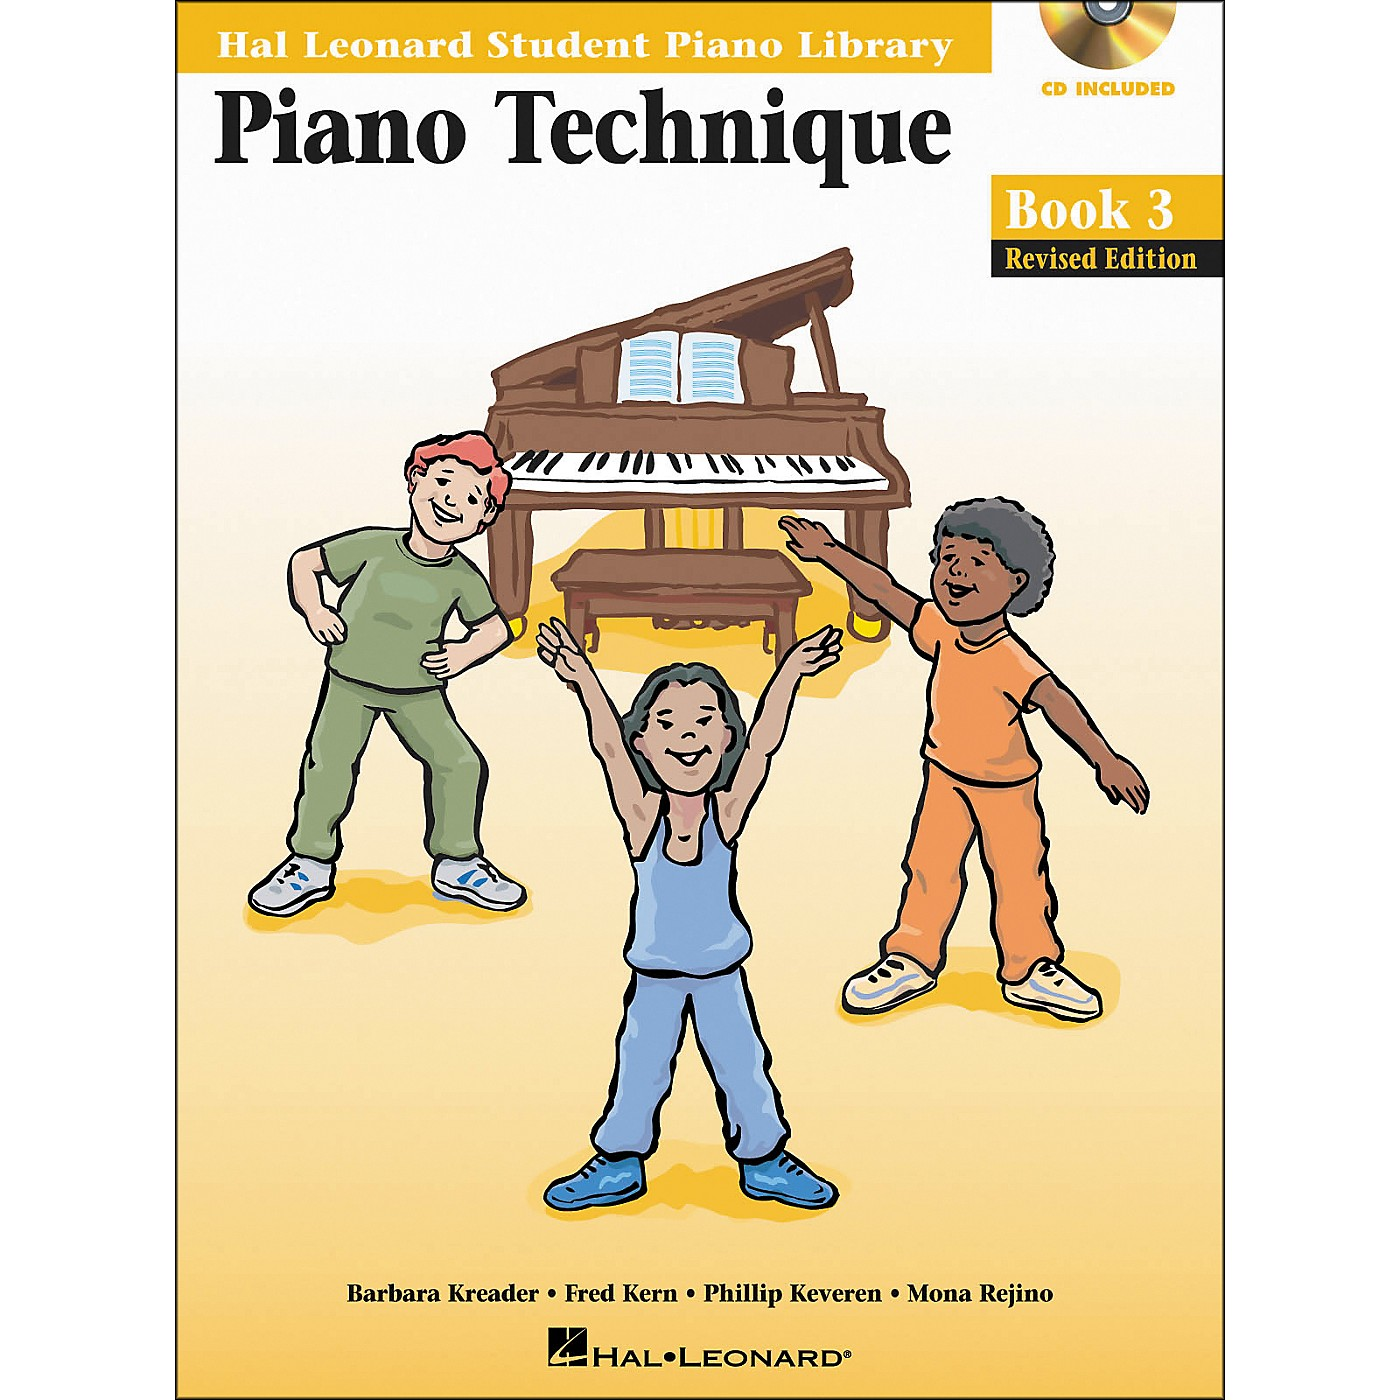 Hal Leonard Piano Technique Book 3 Book/CD Hal Leonard Student Piano Library thumbnail